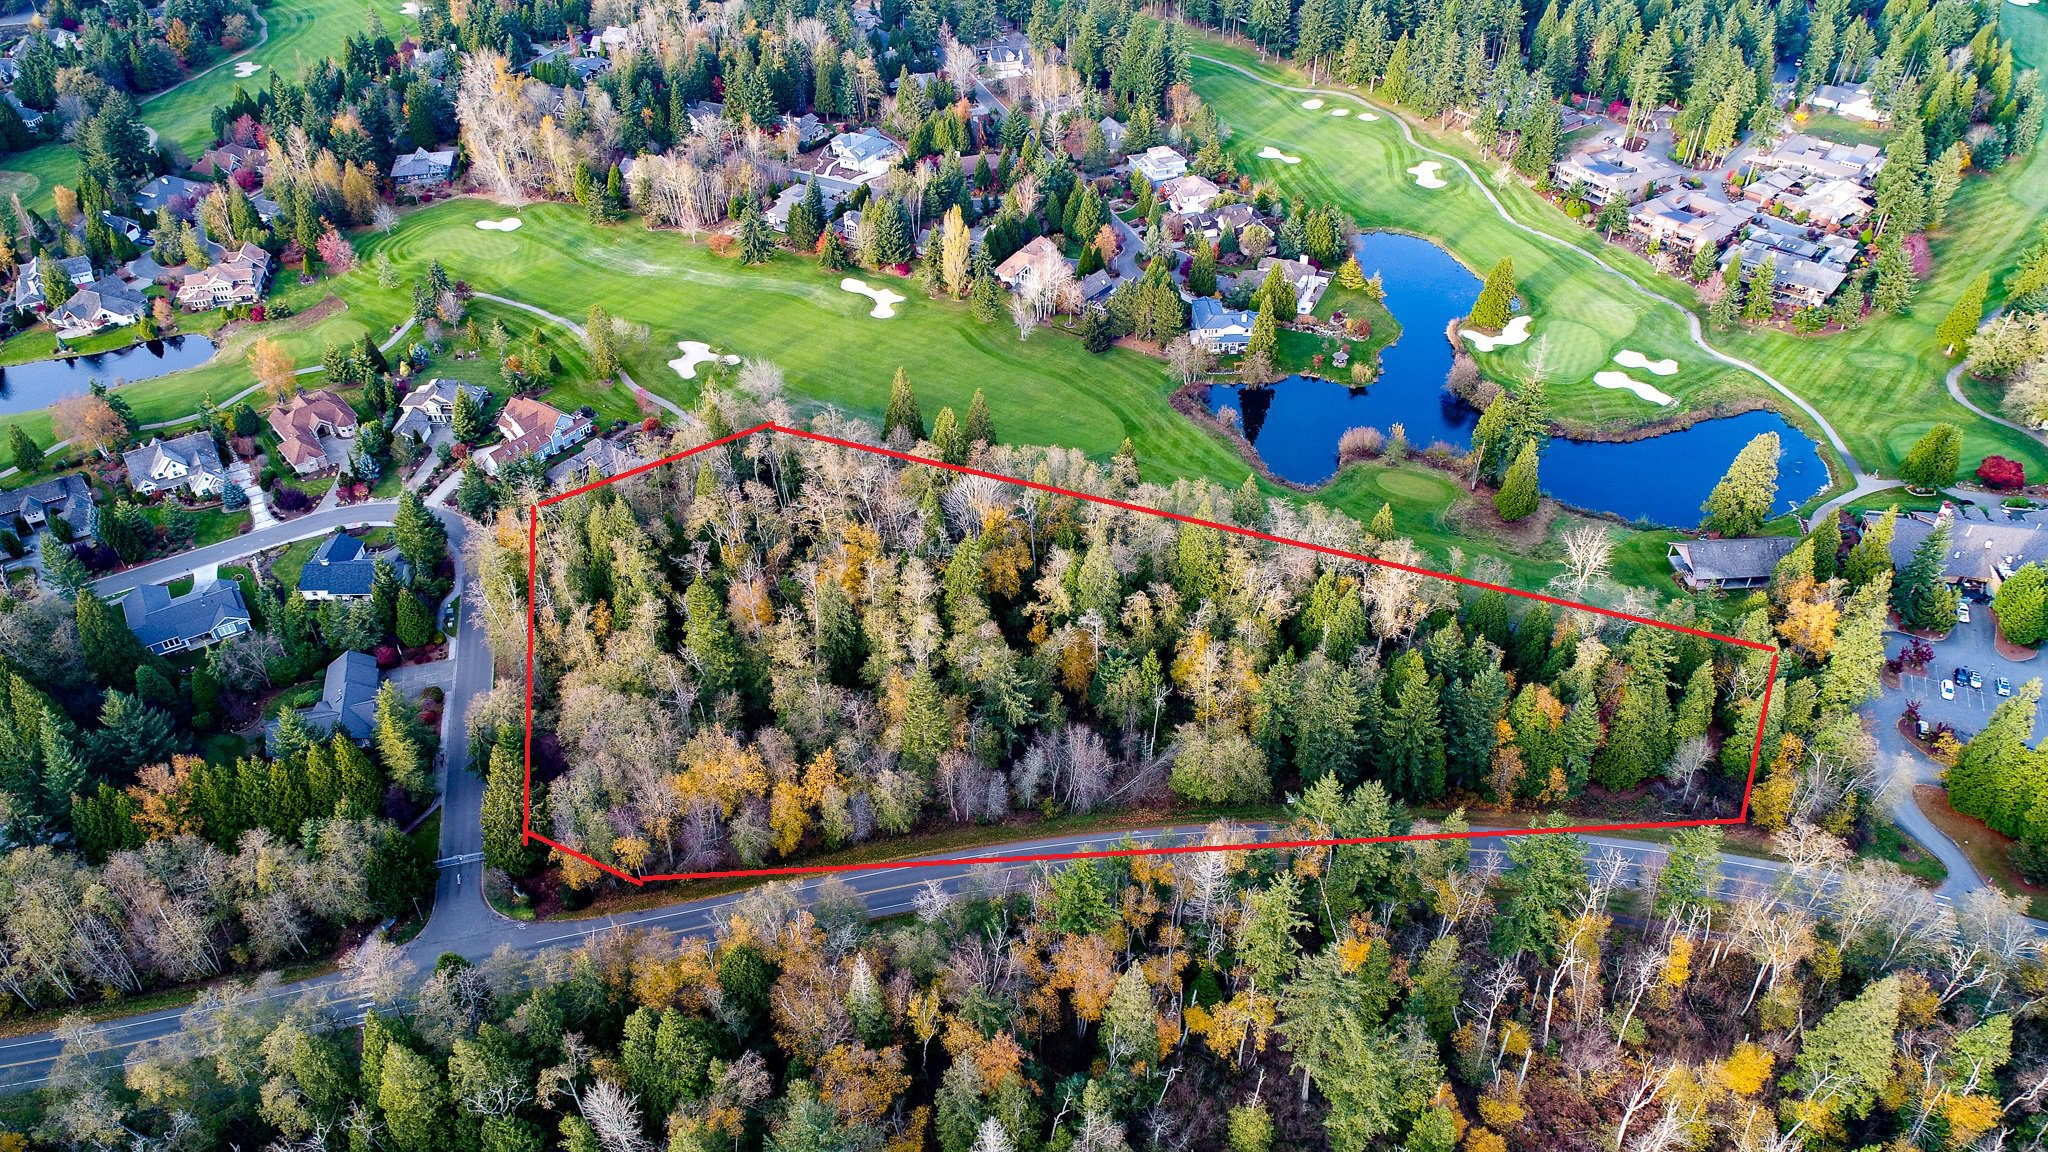 Main Photo: Multifamily lot on Semiahmoo Golf Course